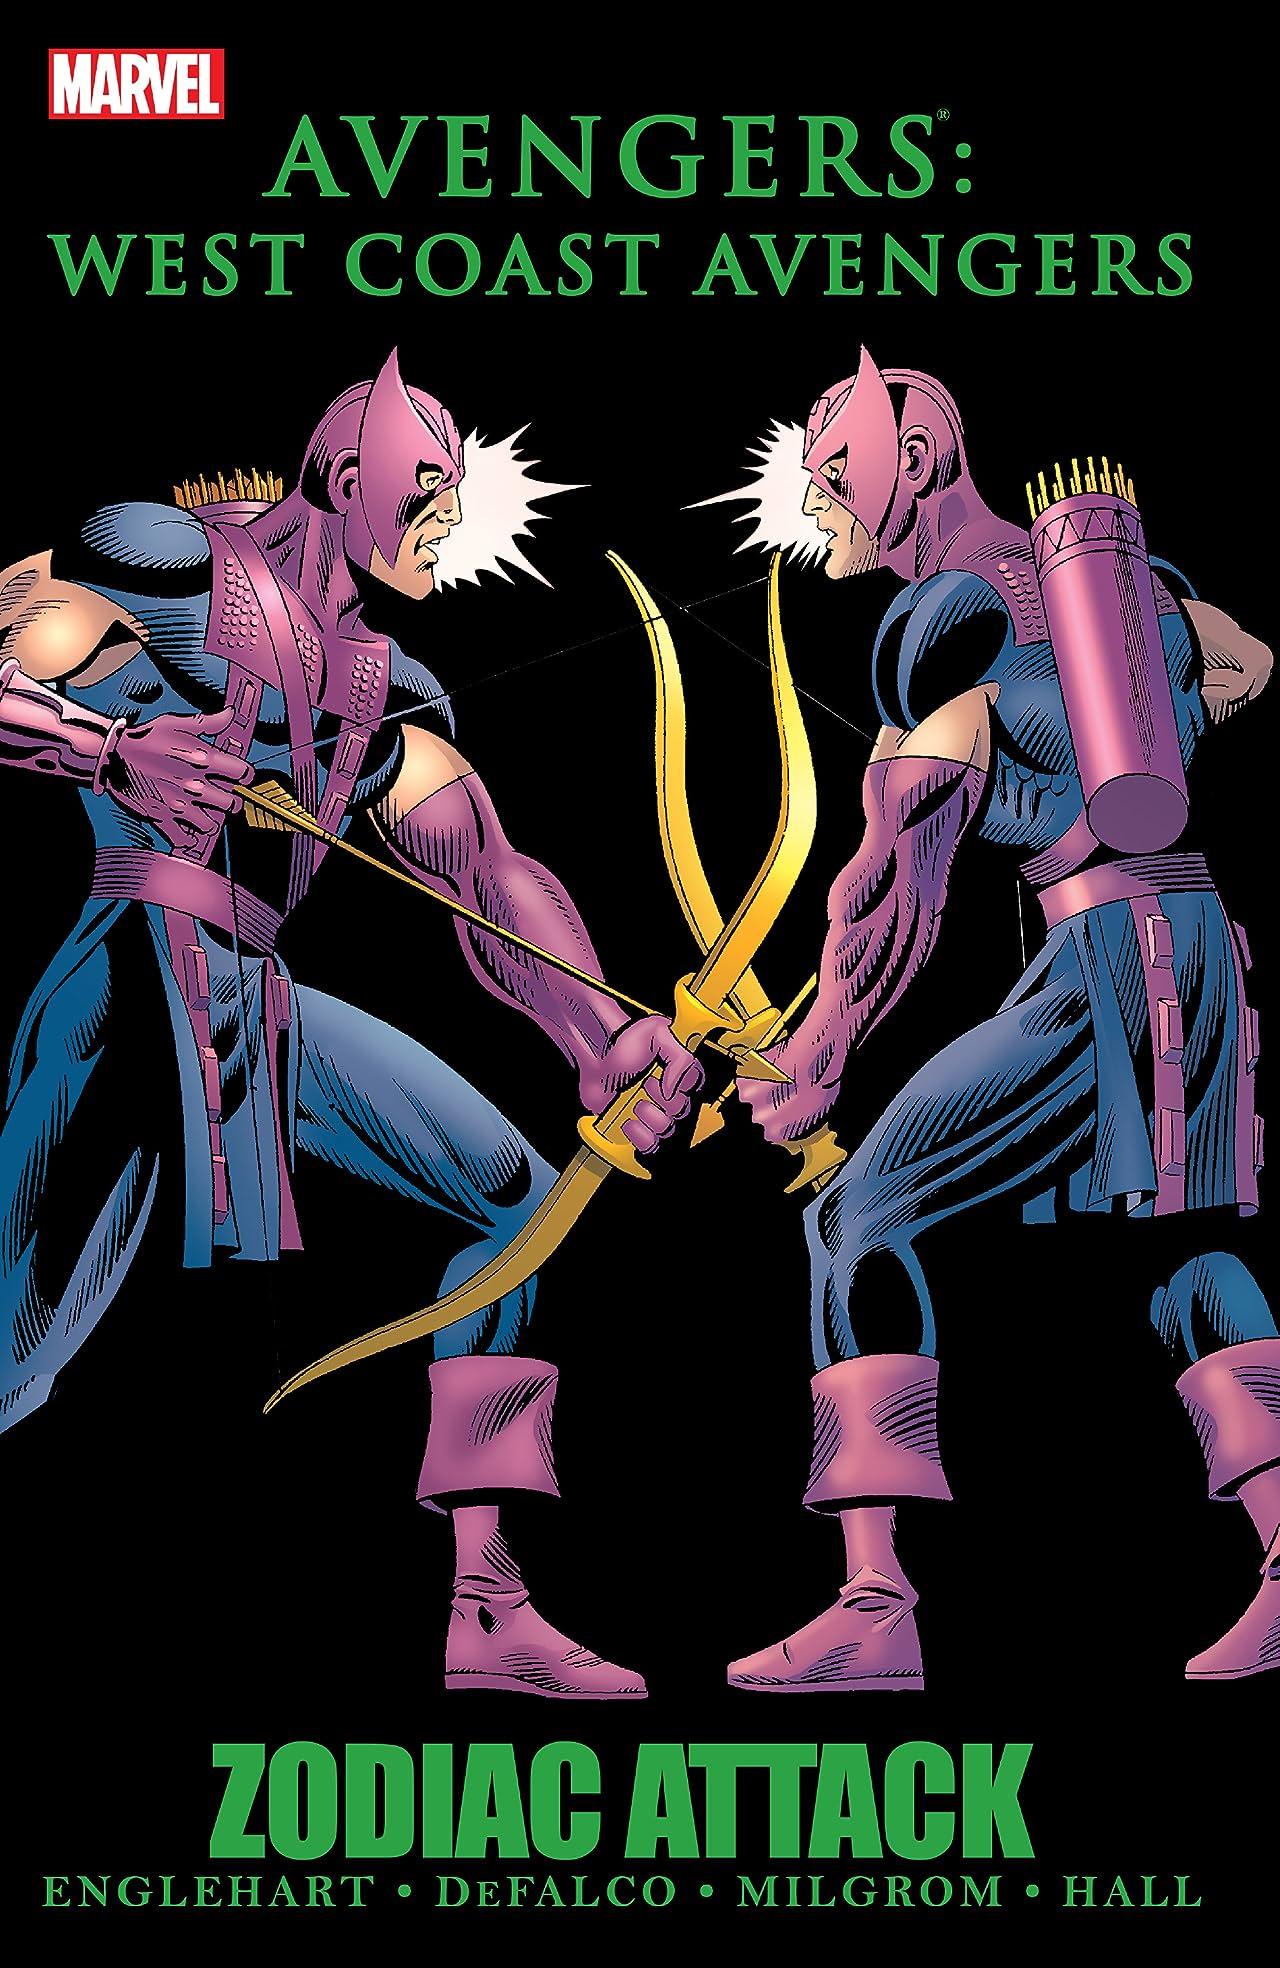 Avengers: Avengers West Coast - Zodiac Attack